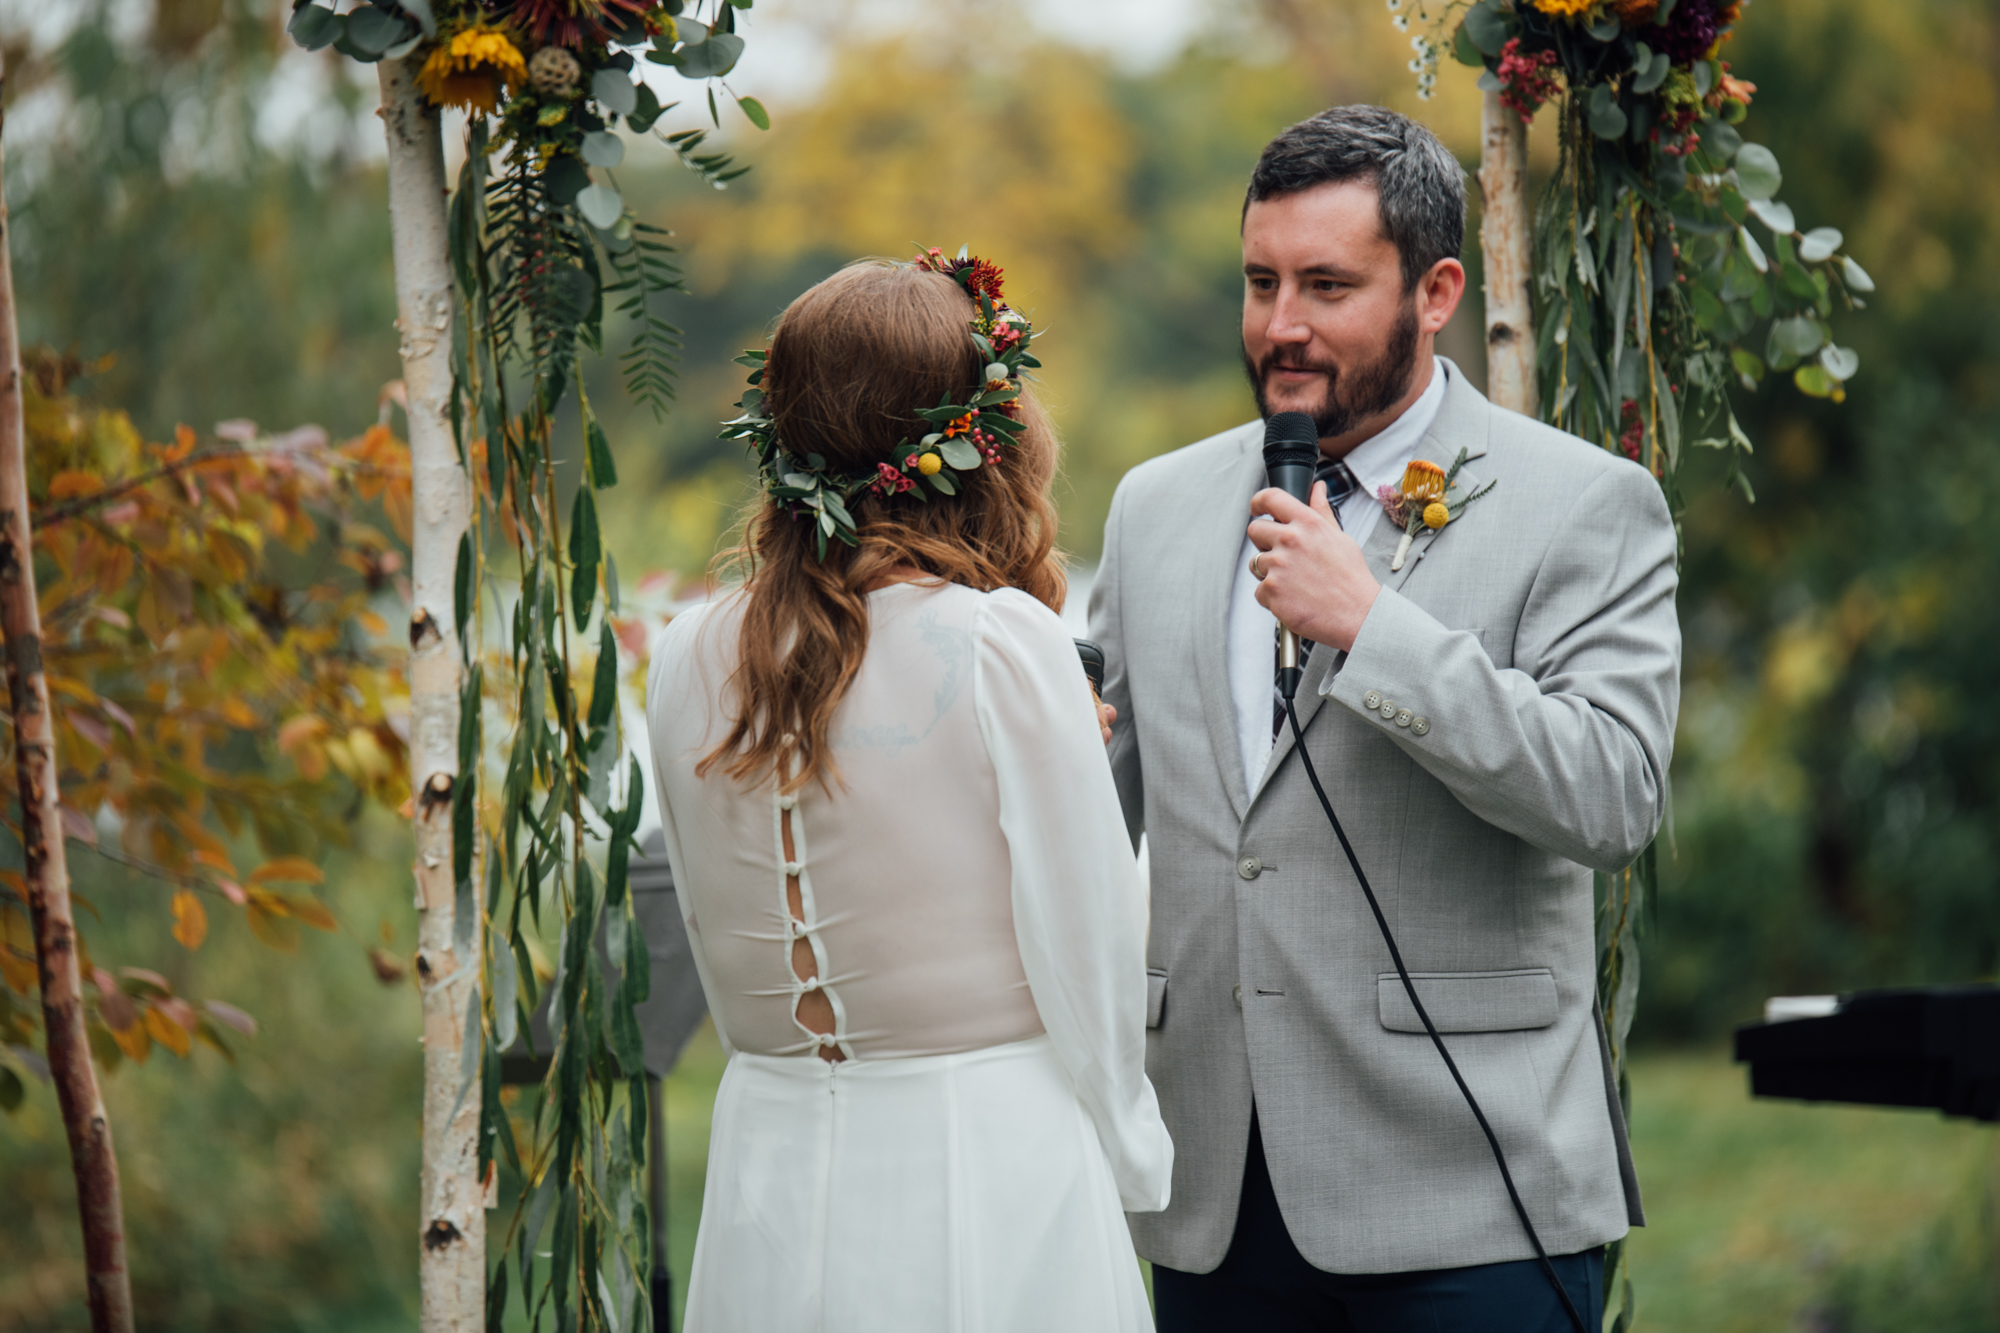 minneapolis-wedding-photographer-1-12.jpg